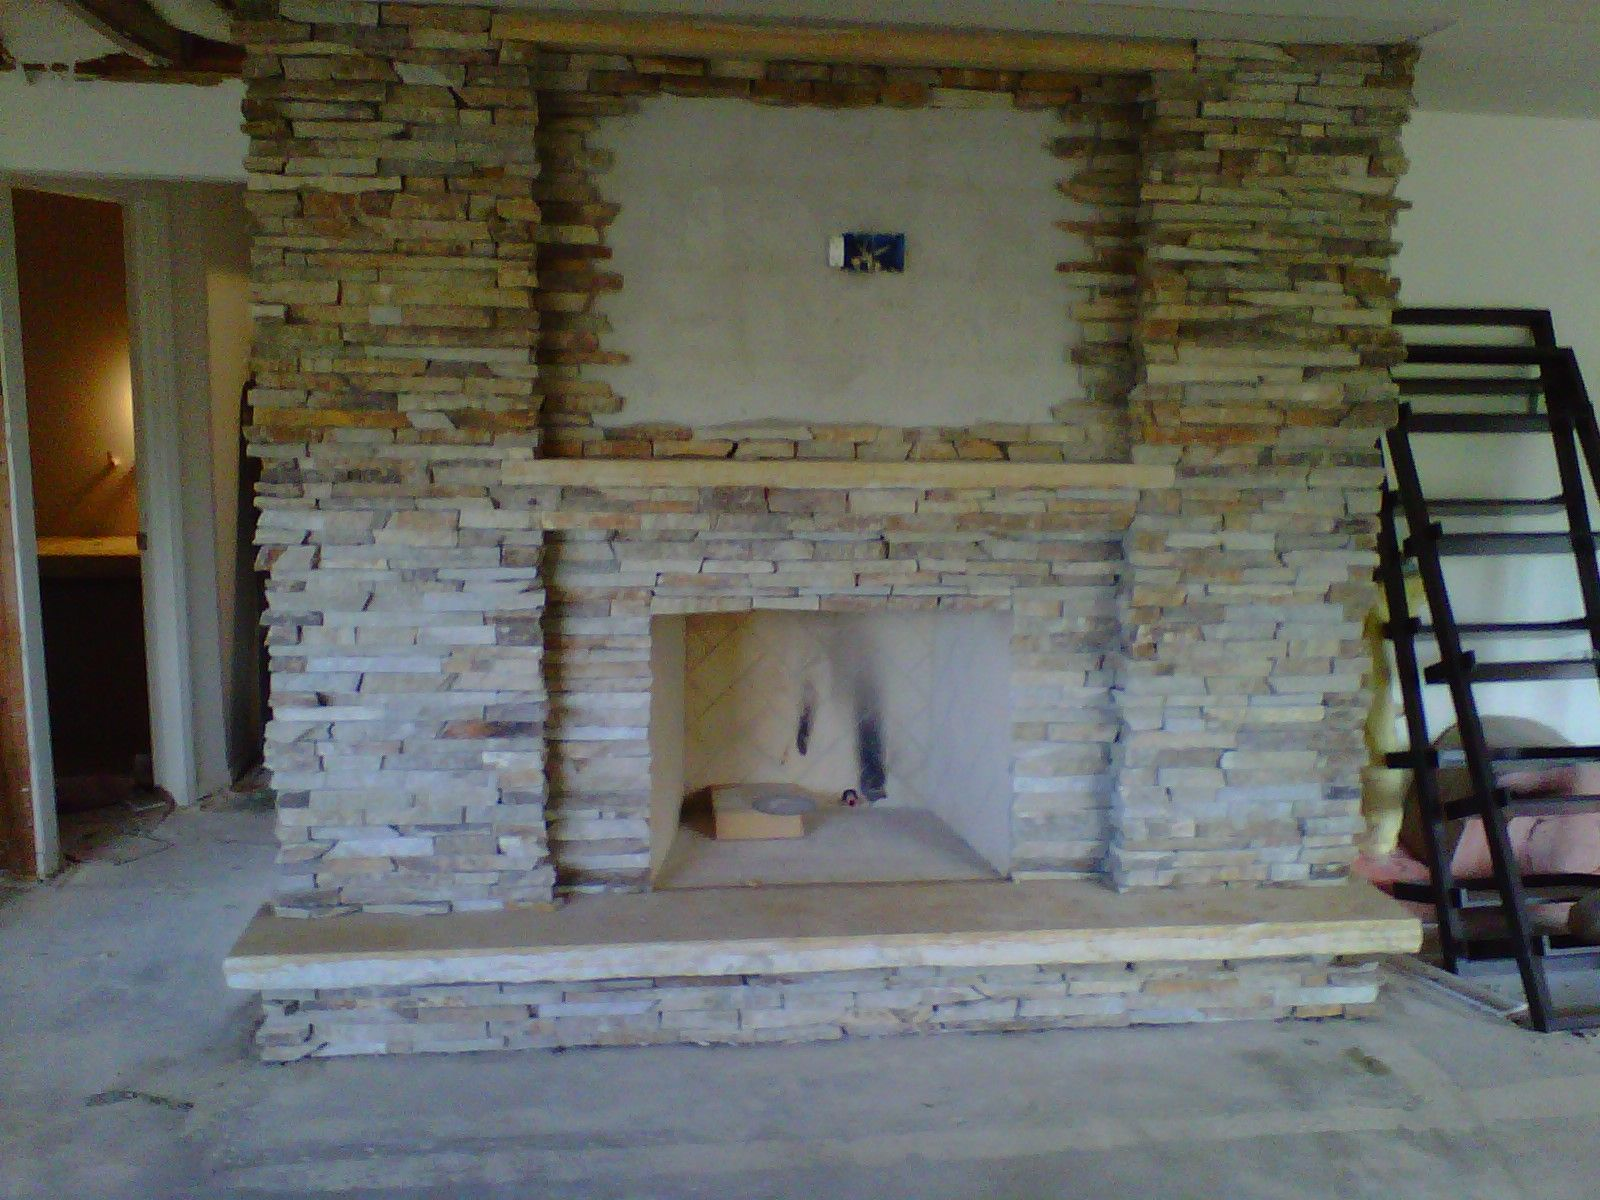 ledgestone+fireplaces | Homeowner design Virginia ledgestone ...